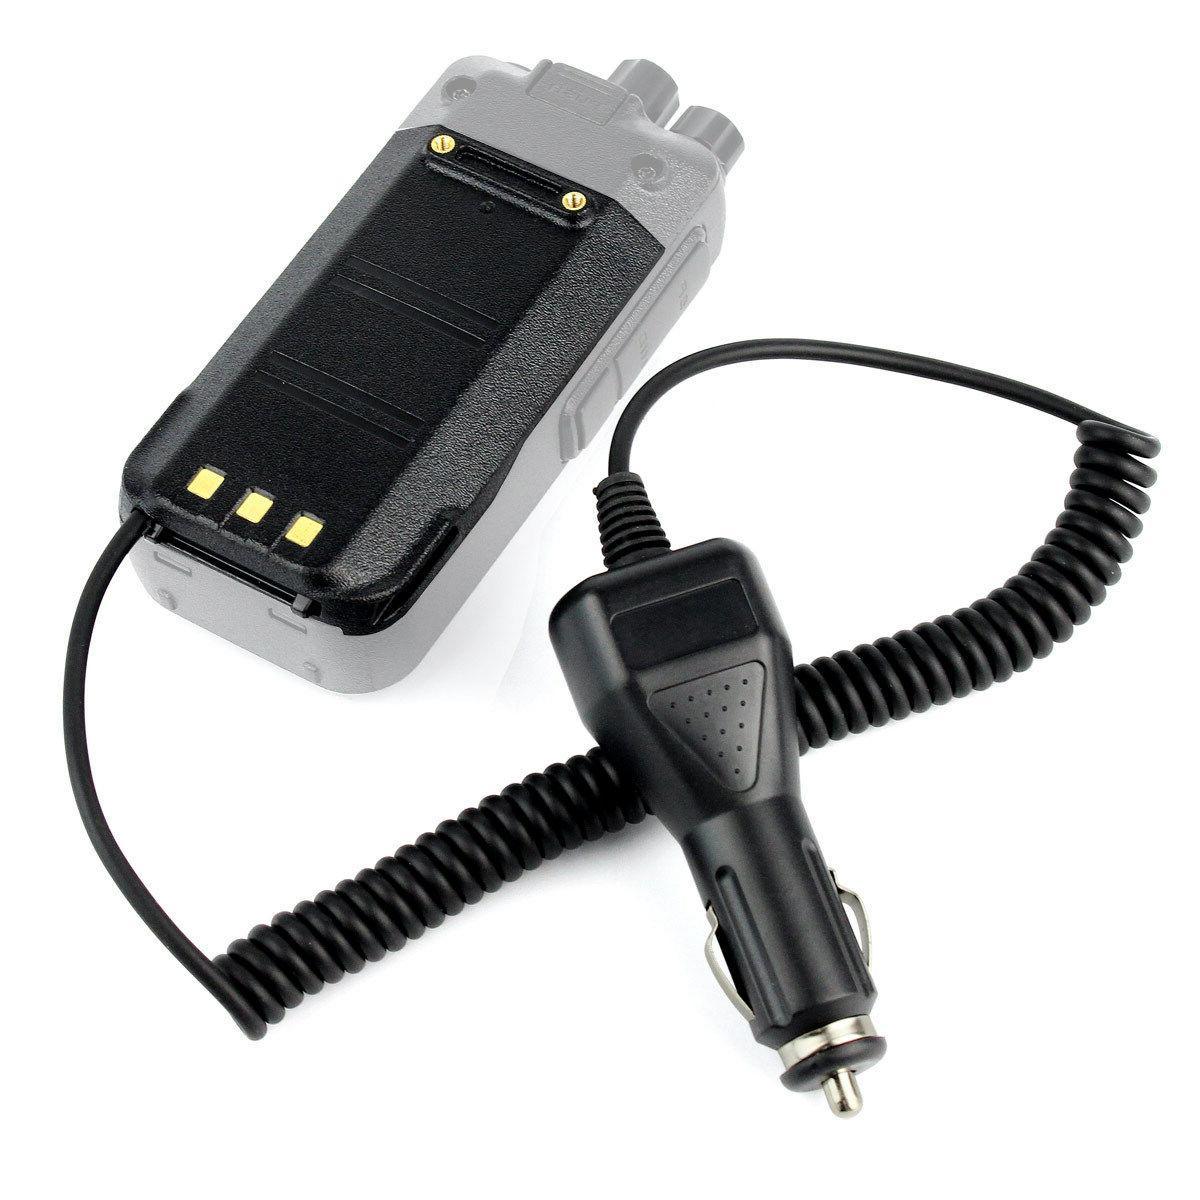 Retevis RT3S RT3 Car Charger Battery Eliminator 2000mAh Walk